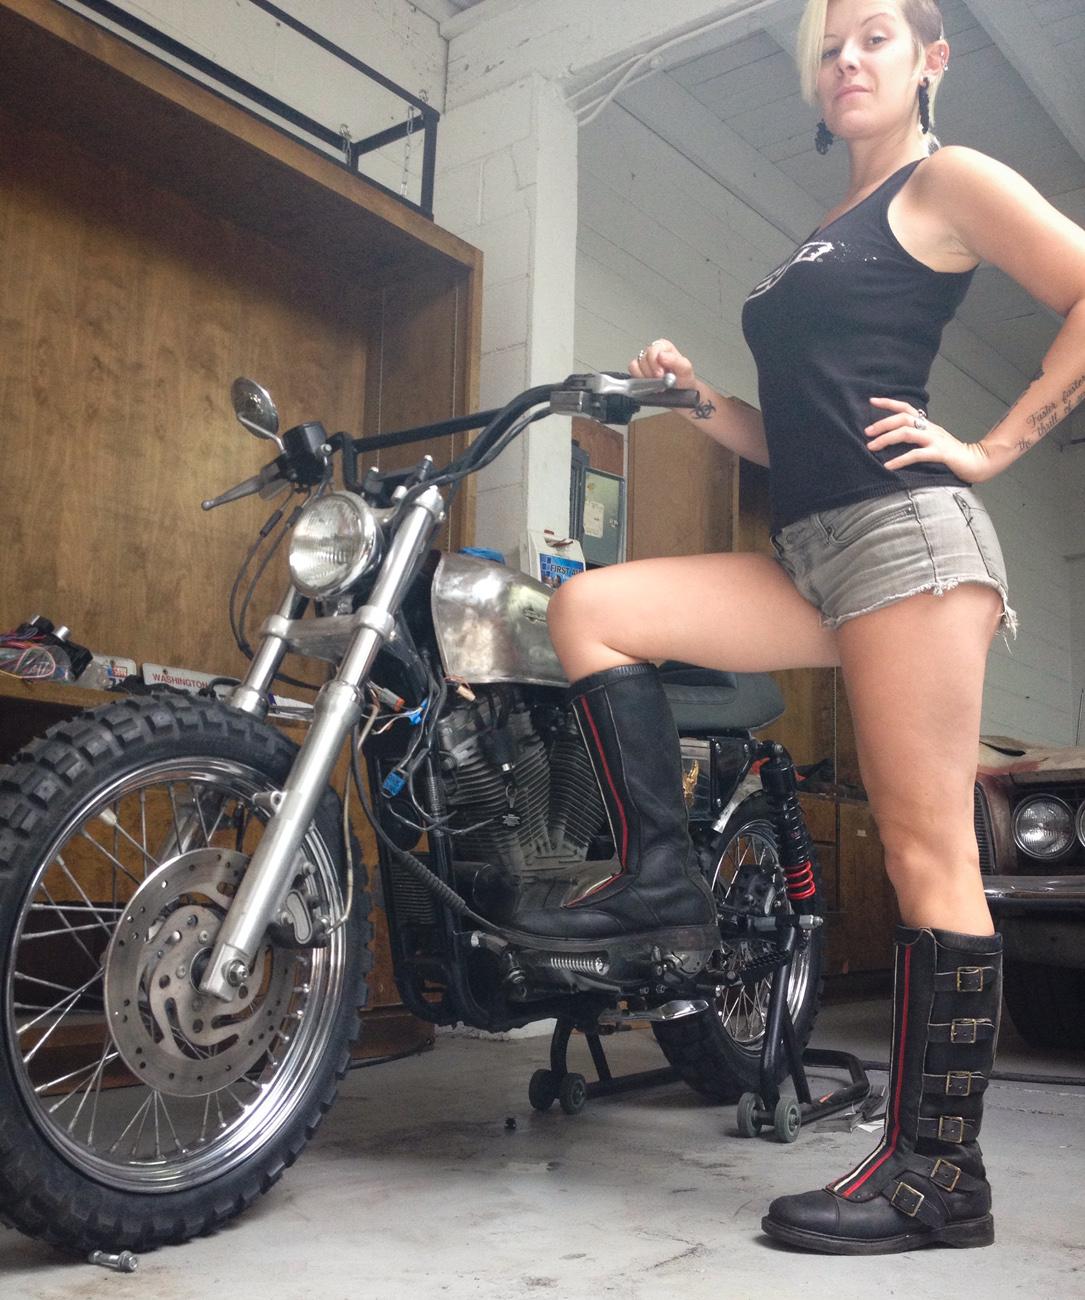 wheelsport-ruggedrider-boots